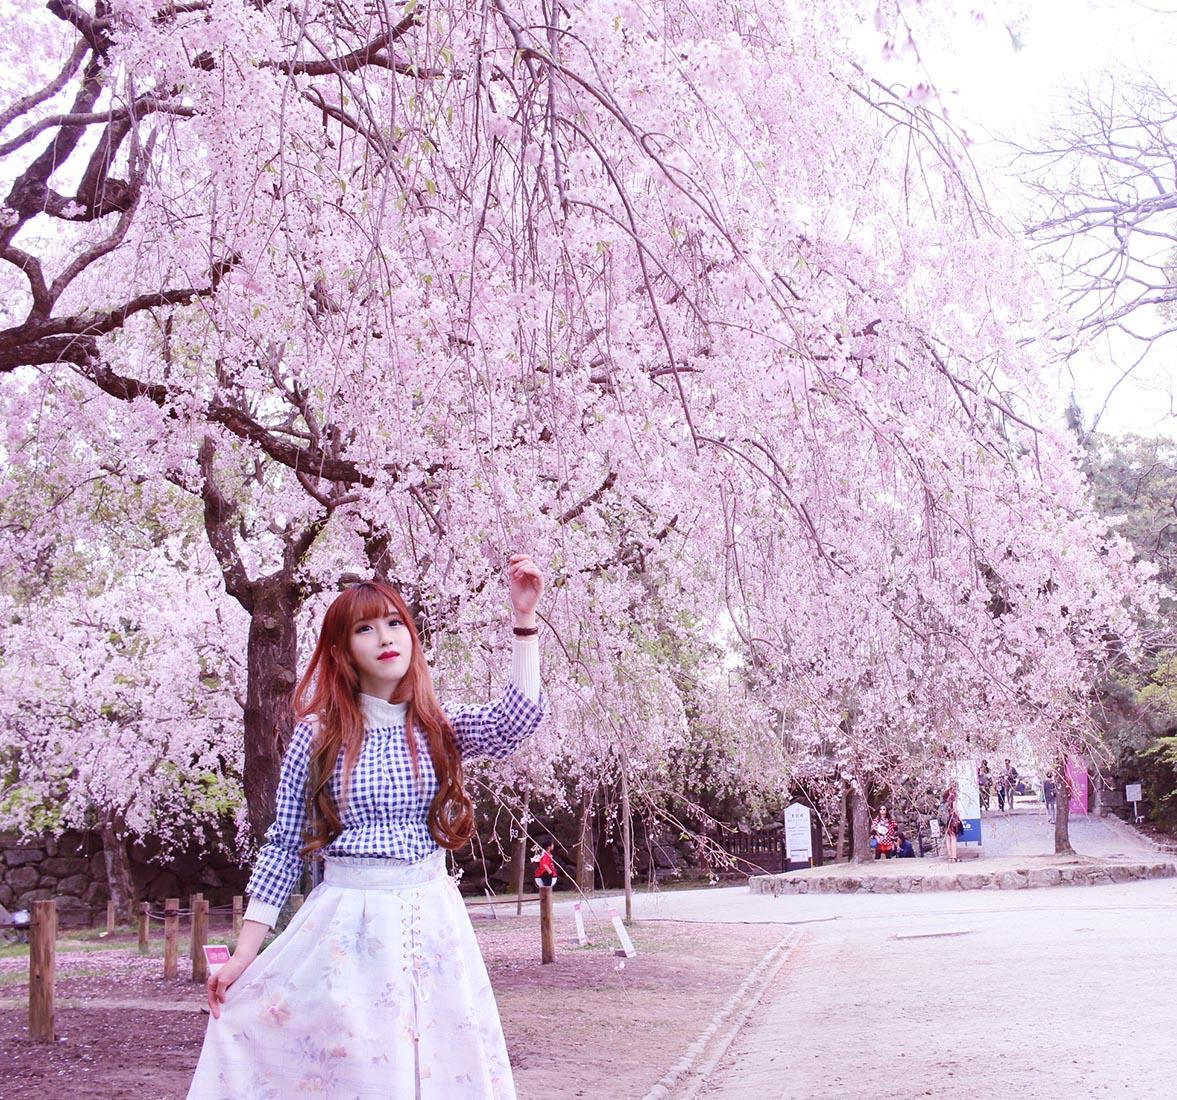 Top Things To Do In Langkawi Traveloka Travel Guide 2018: Fukuoka Travel Guide: Fukuoka Castle Cherry Blossom